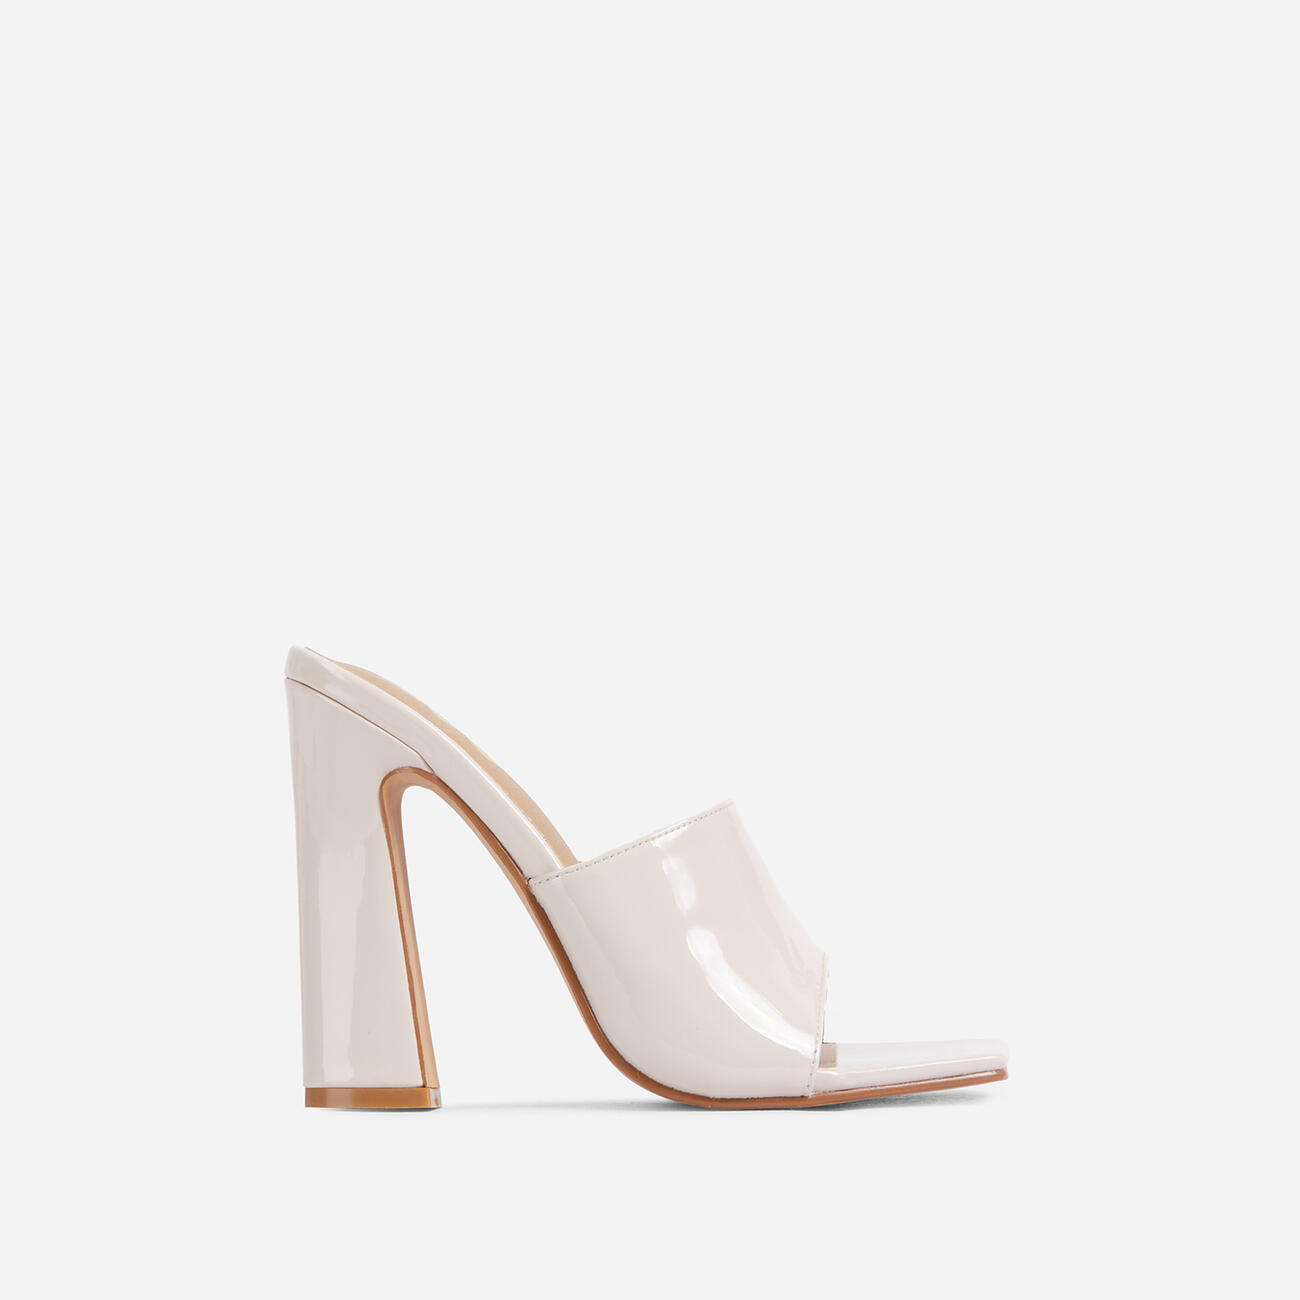 Begins Square Peep Toe Flared Block Heel Mule In Cream Patent Image 1